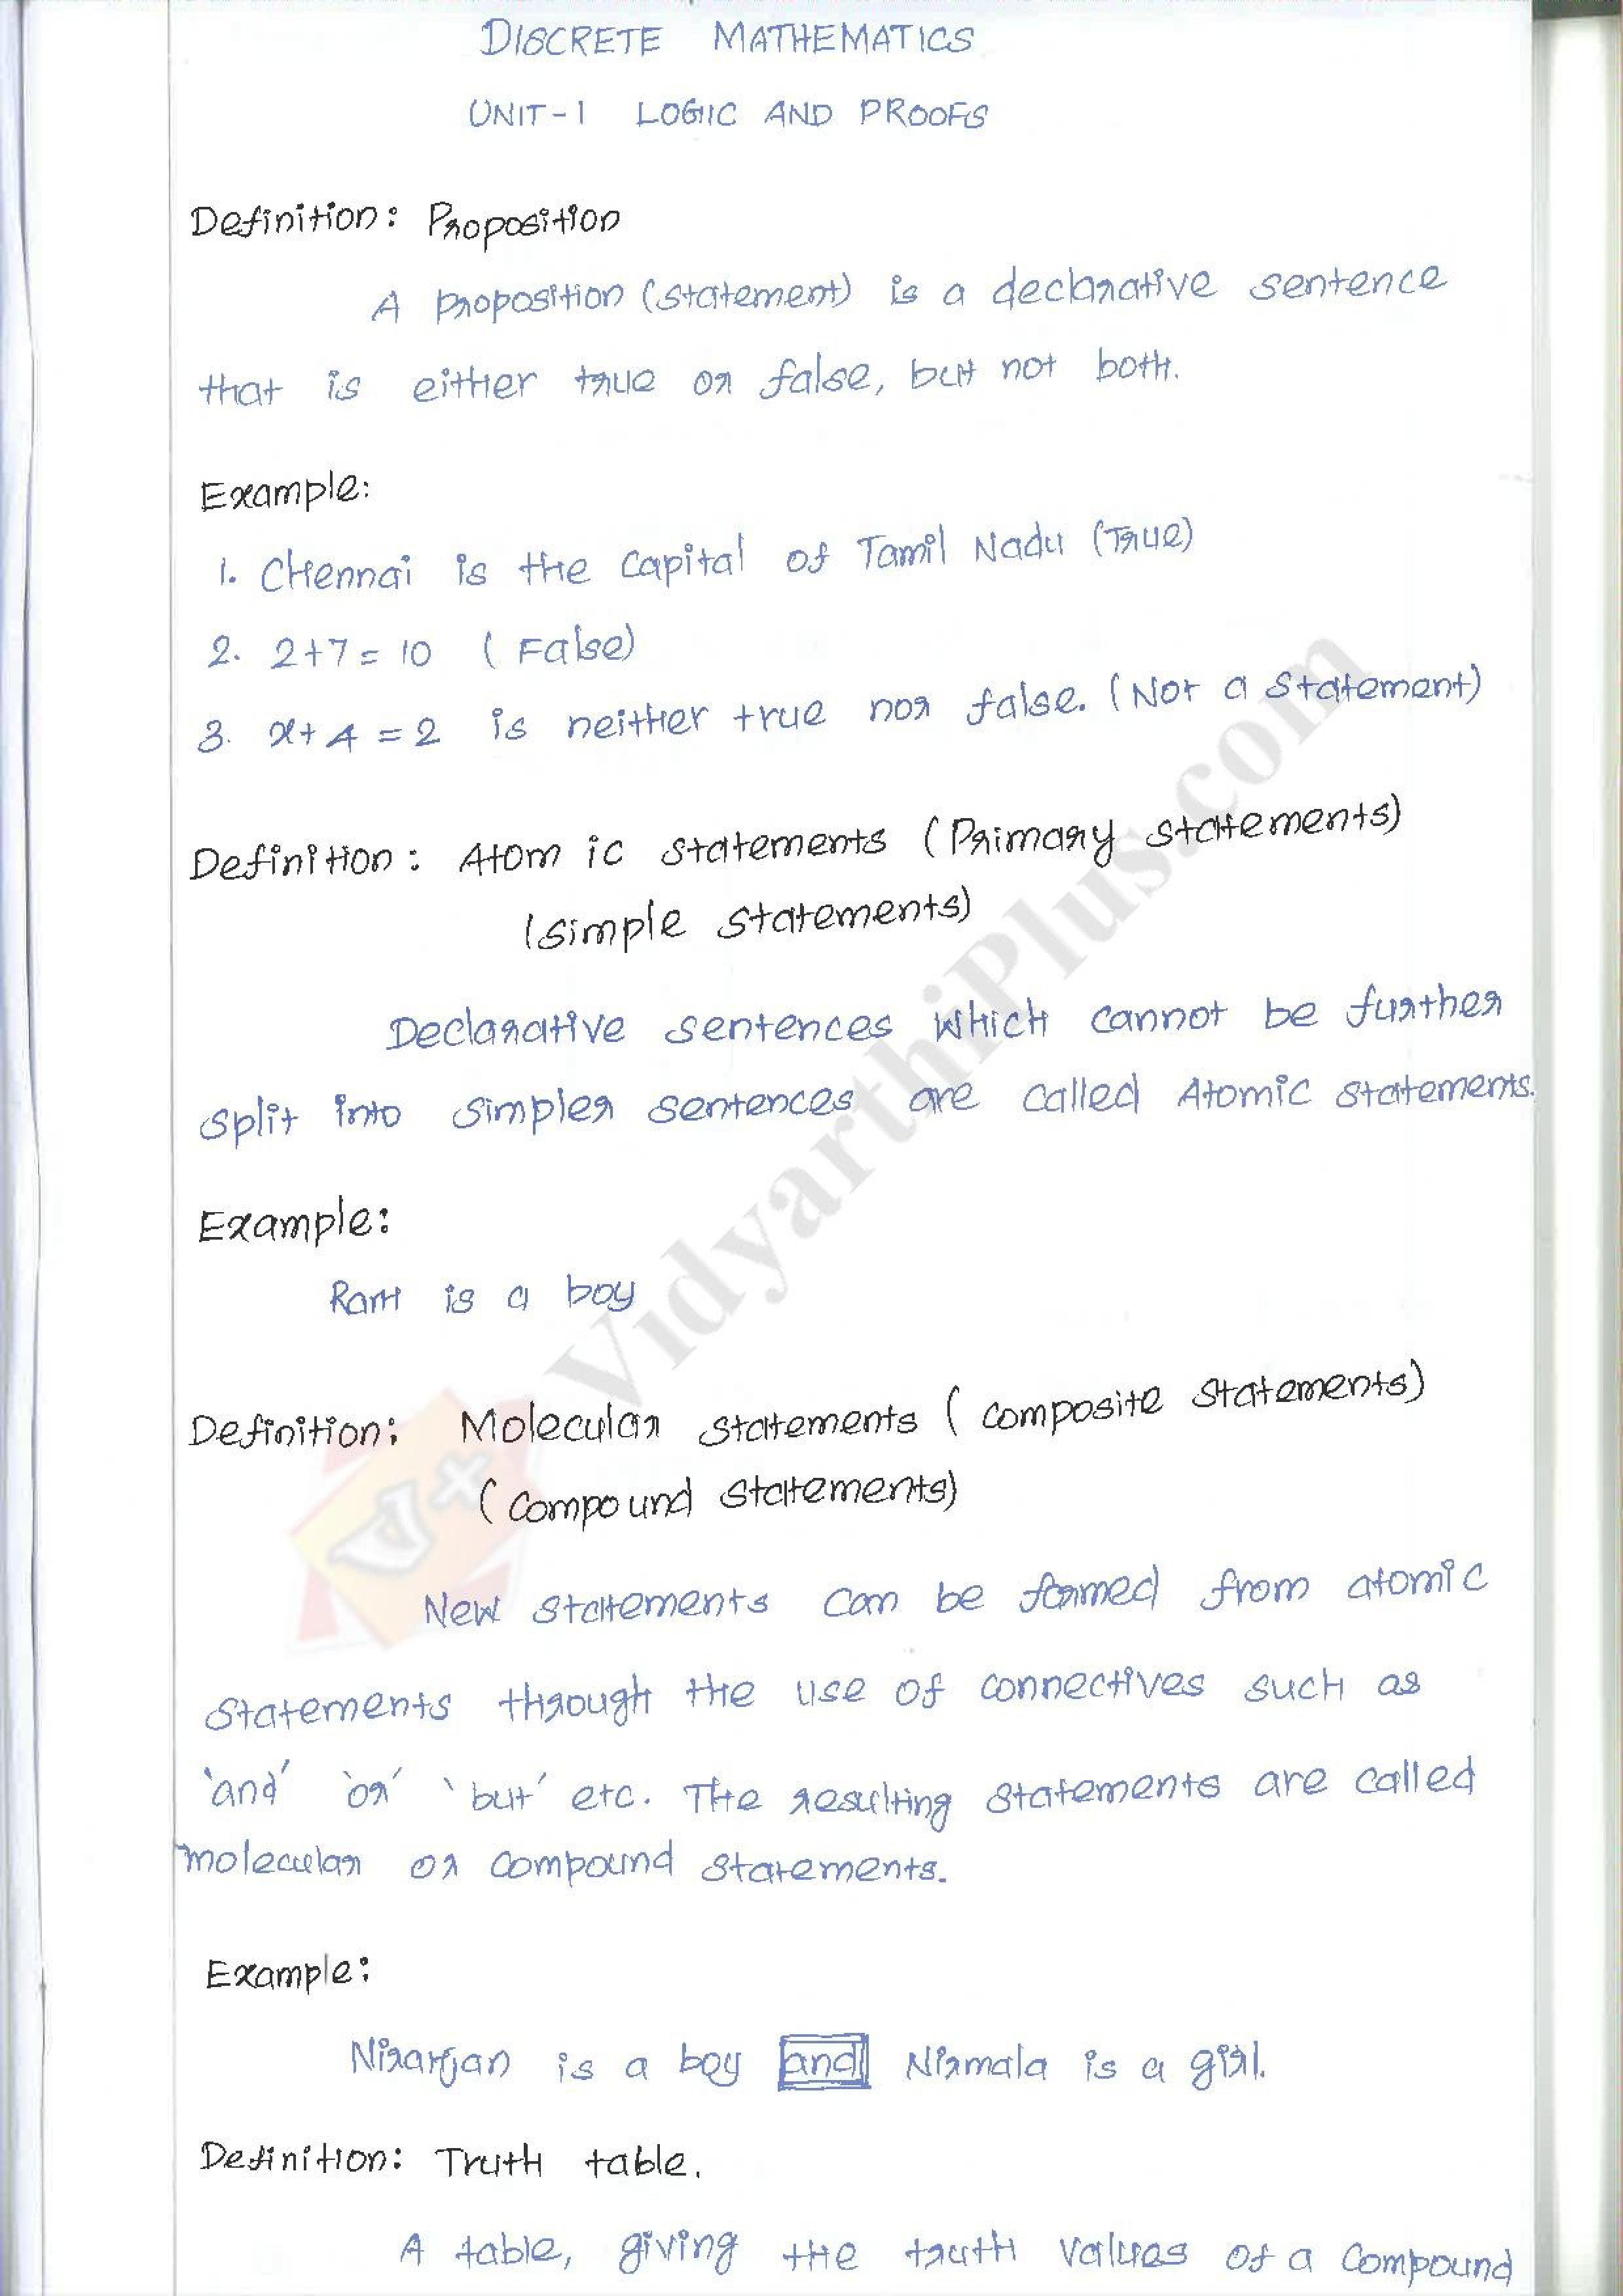 Discrete Mathematics Premium Lecture Notes (All Units) - Deepthi Edition